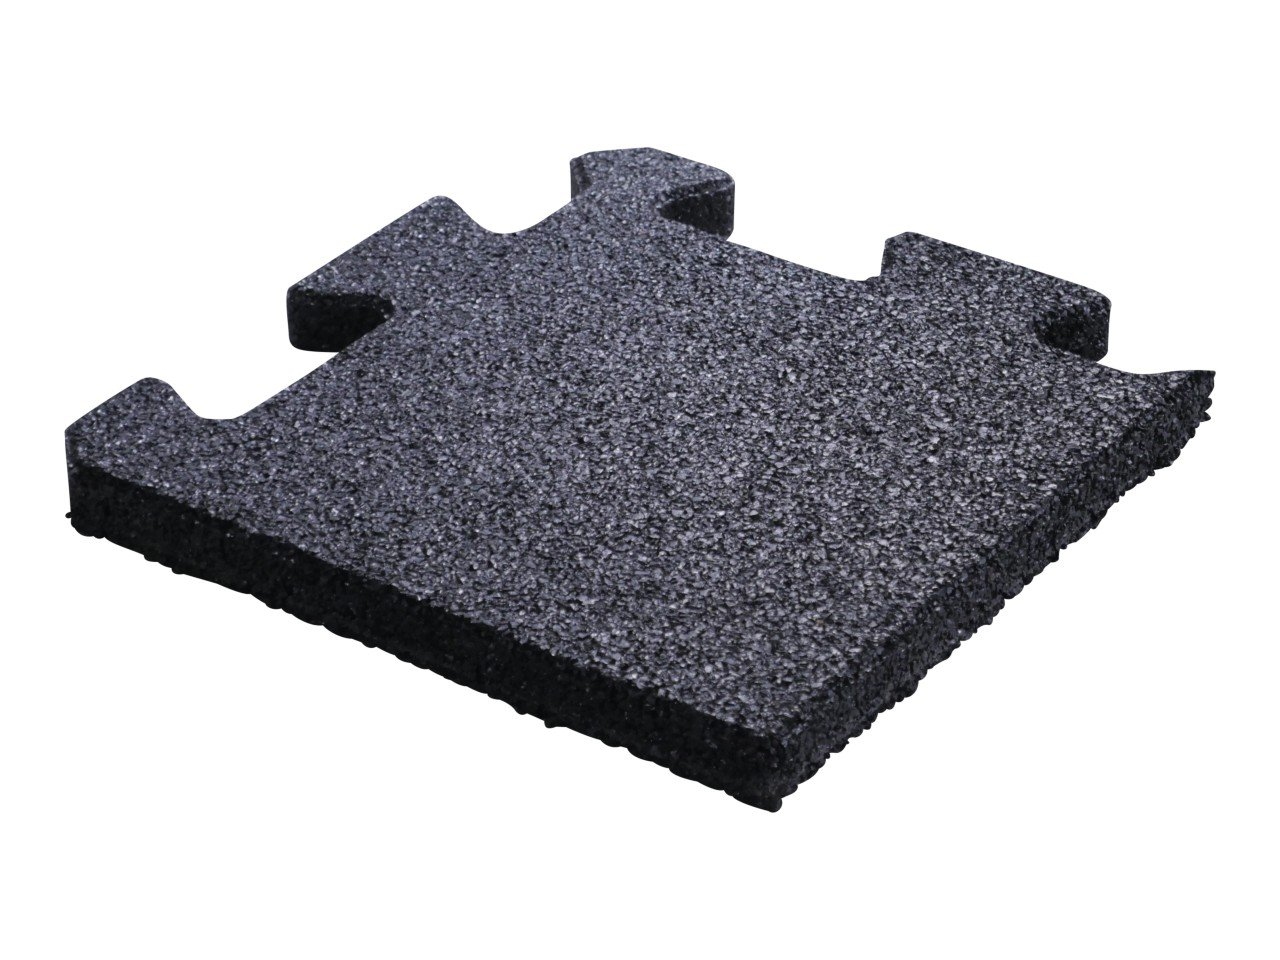 Crossmaxx Jigsaw Gummiflise Hjørne 25 x 25 x 2 cm